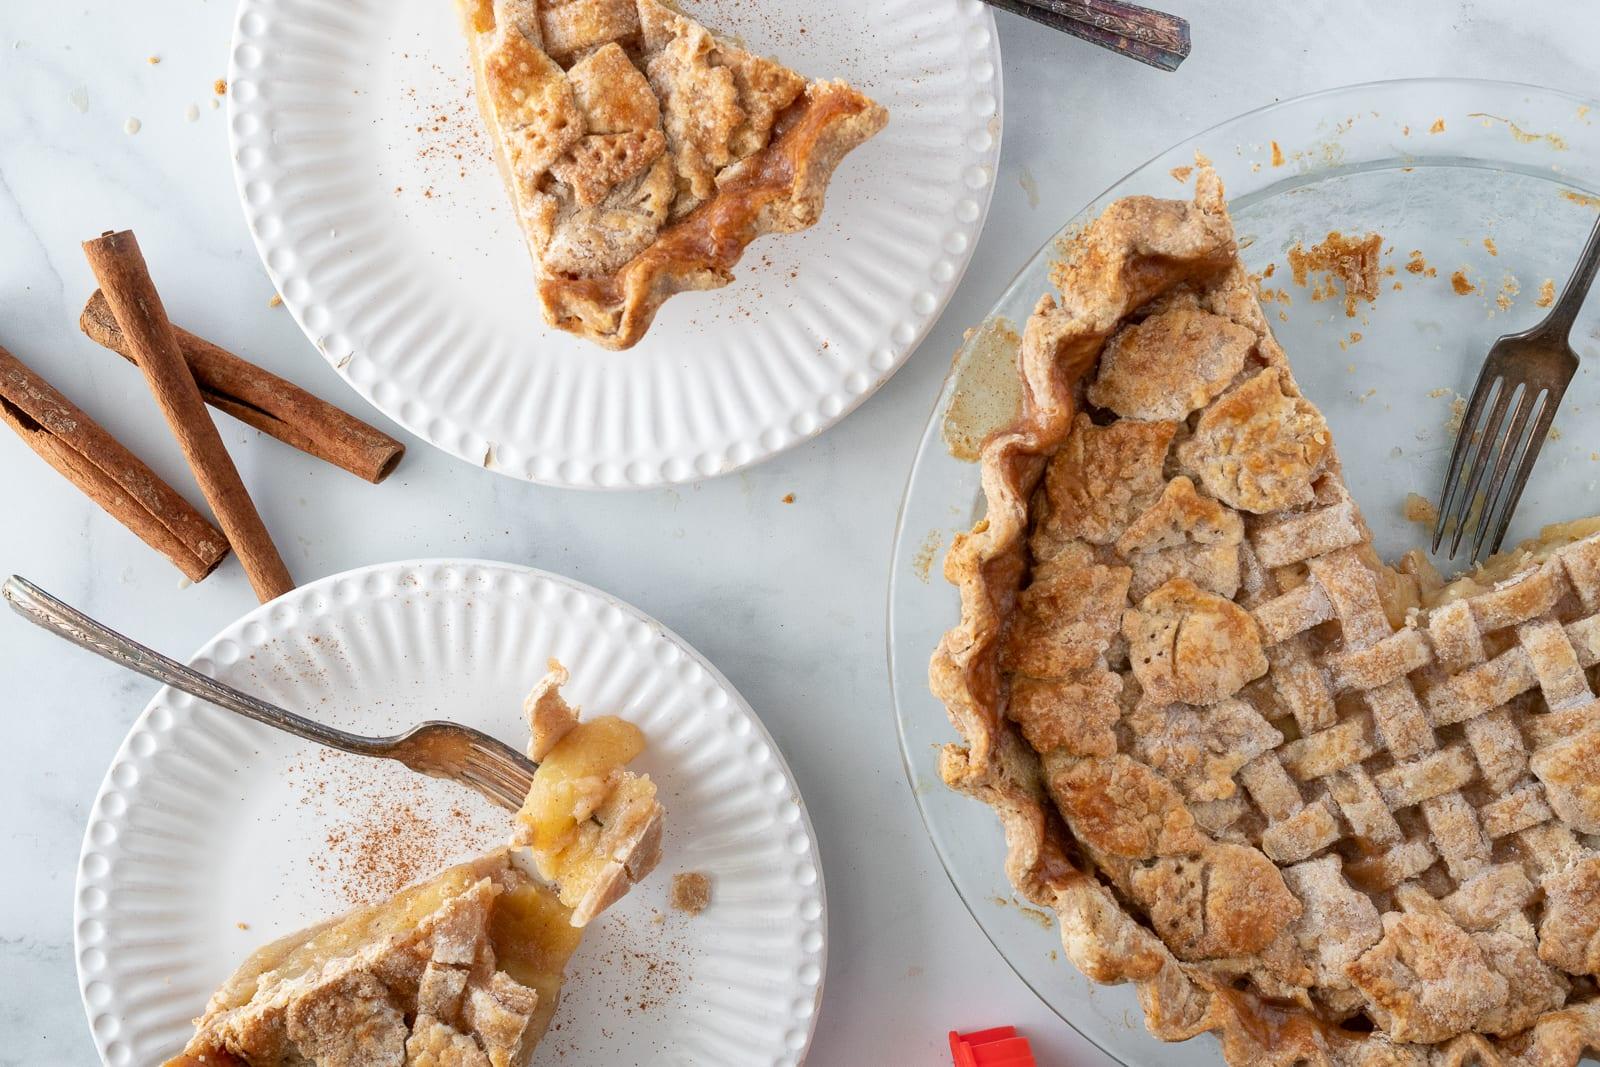 The perfect Apple Pie